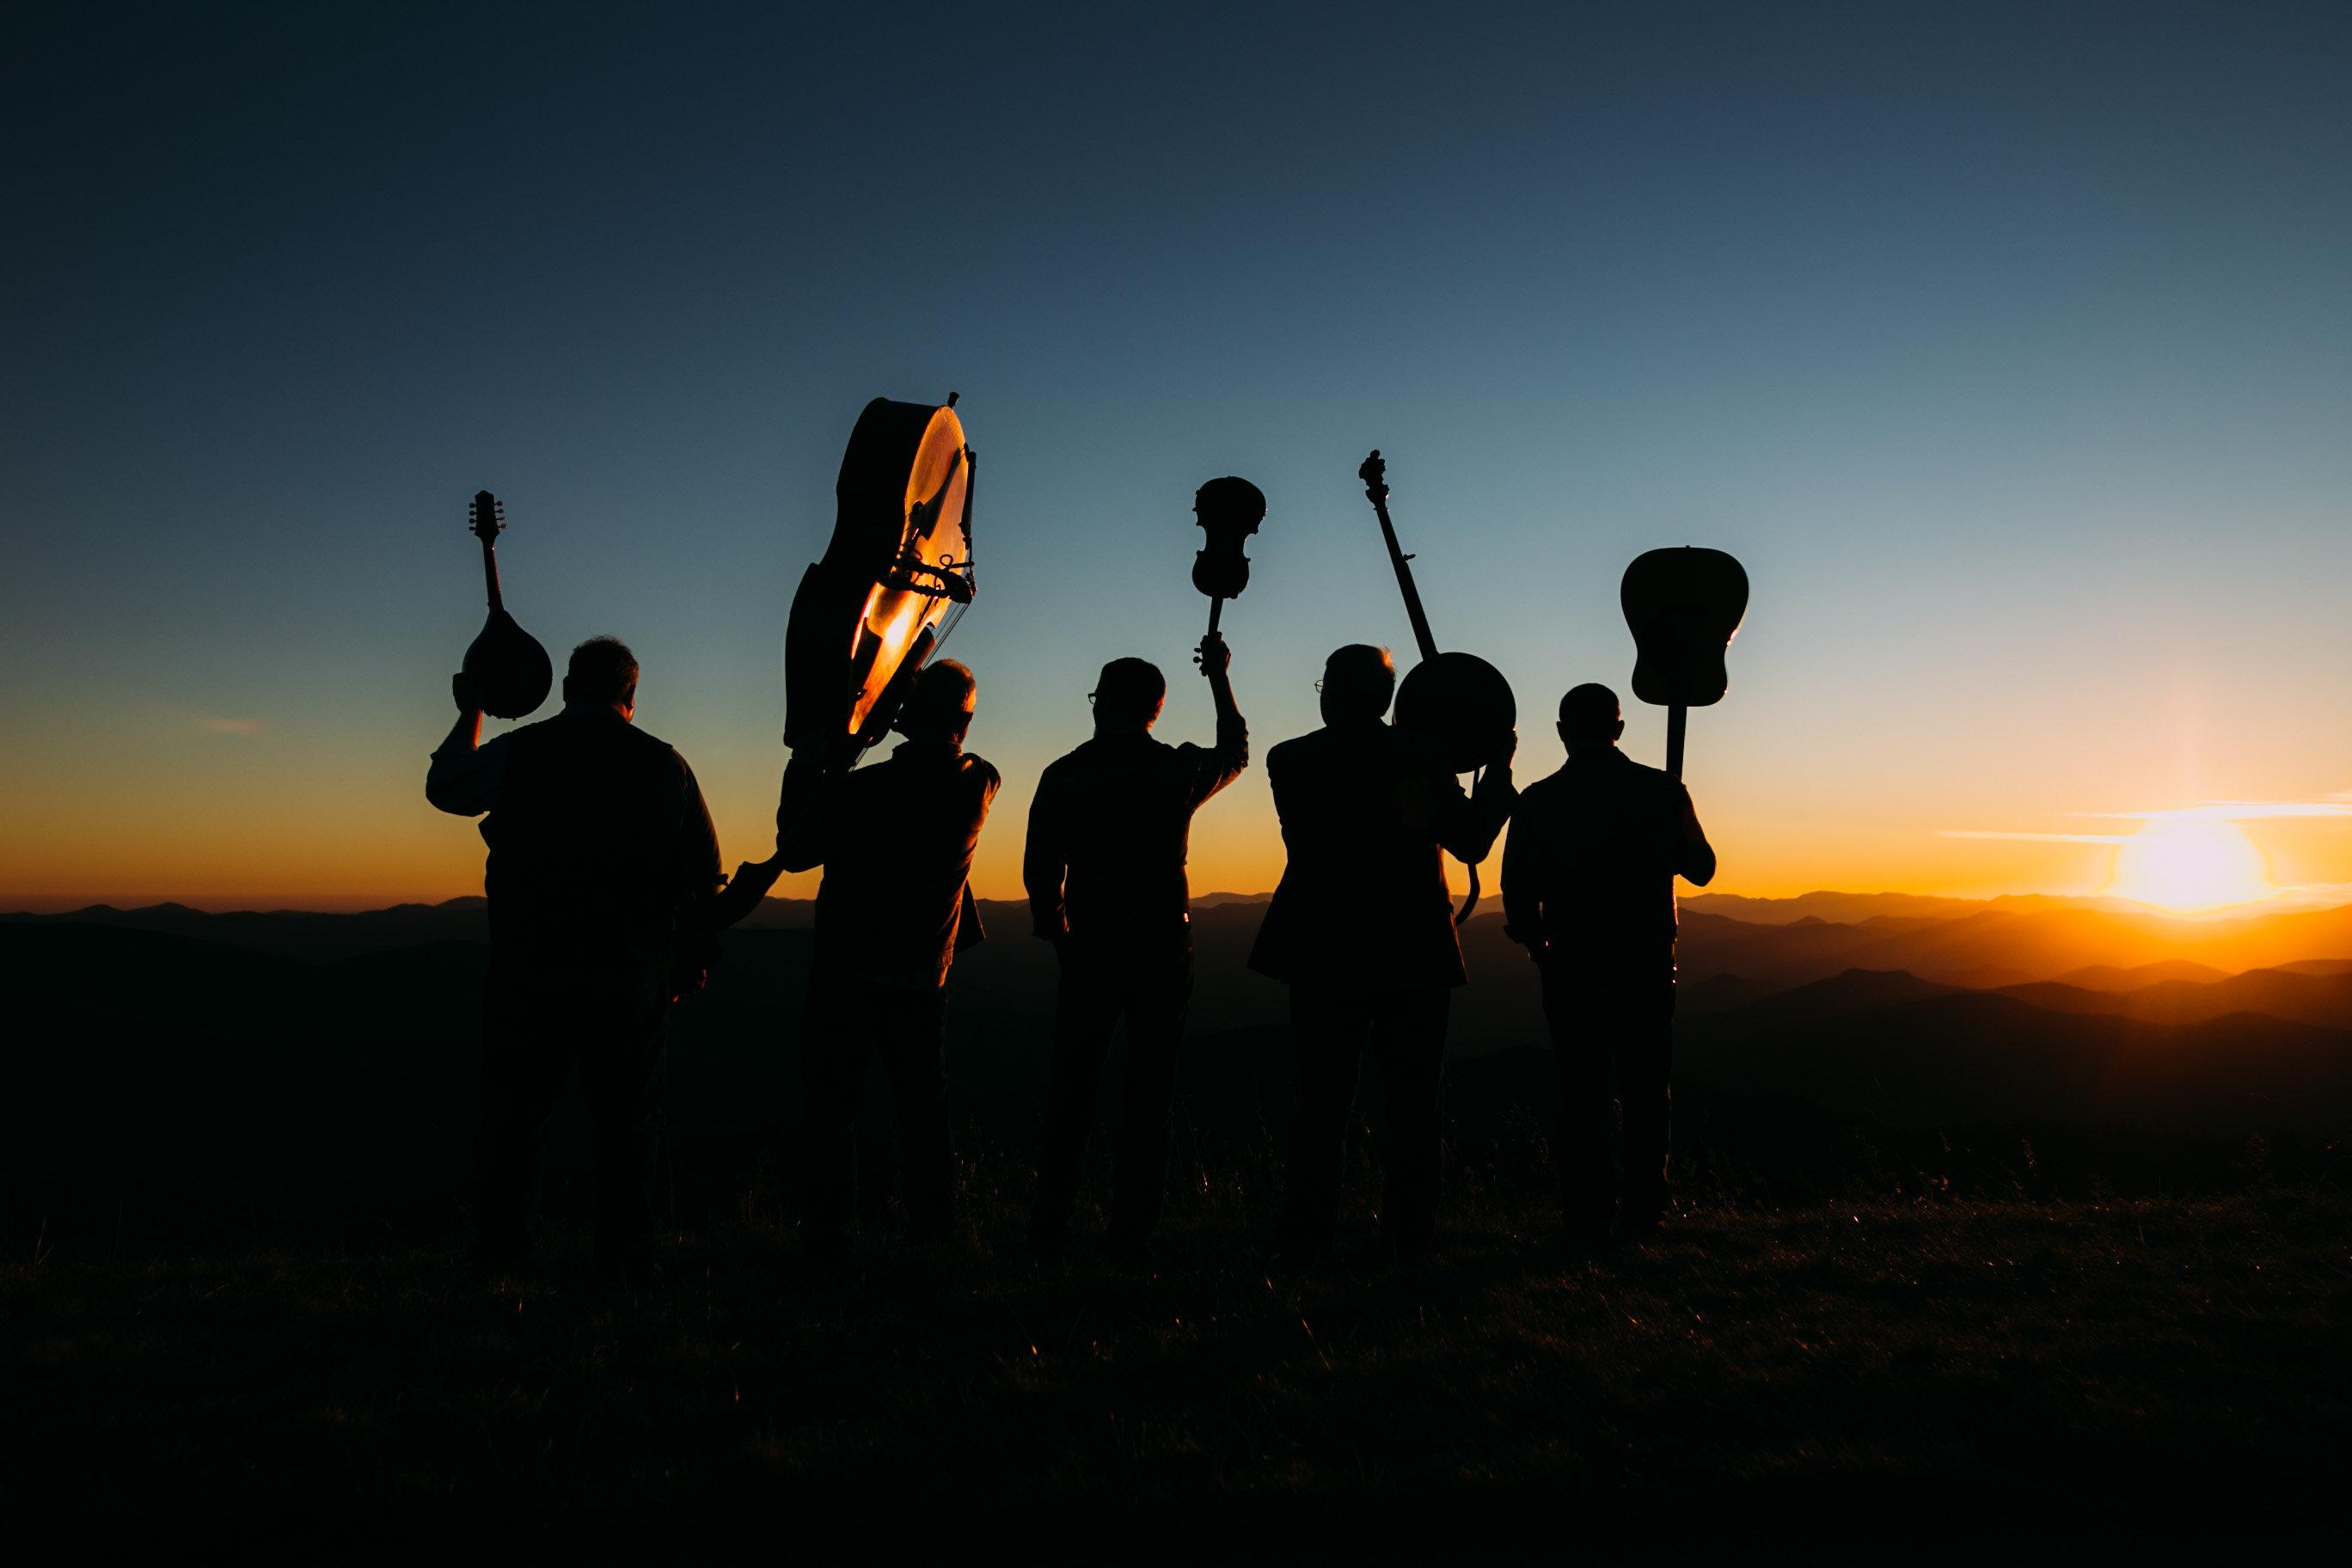 Concert on the Lawn: Balsam Range